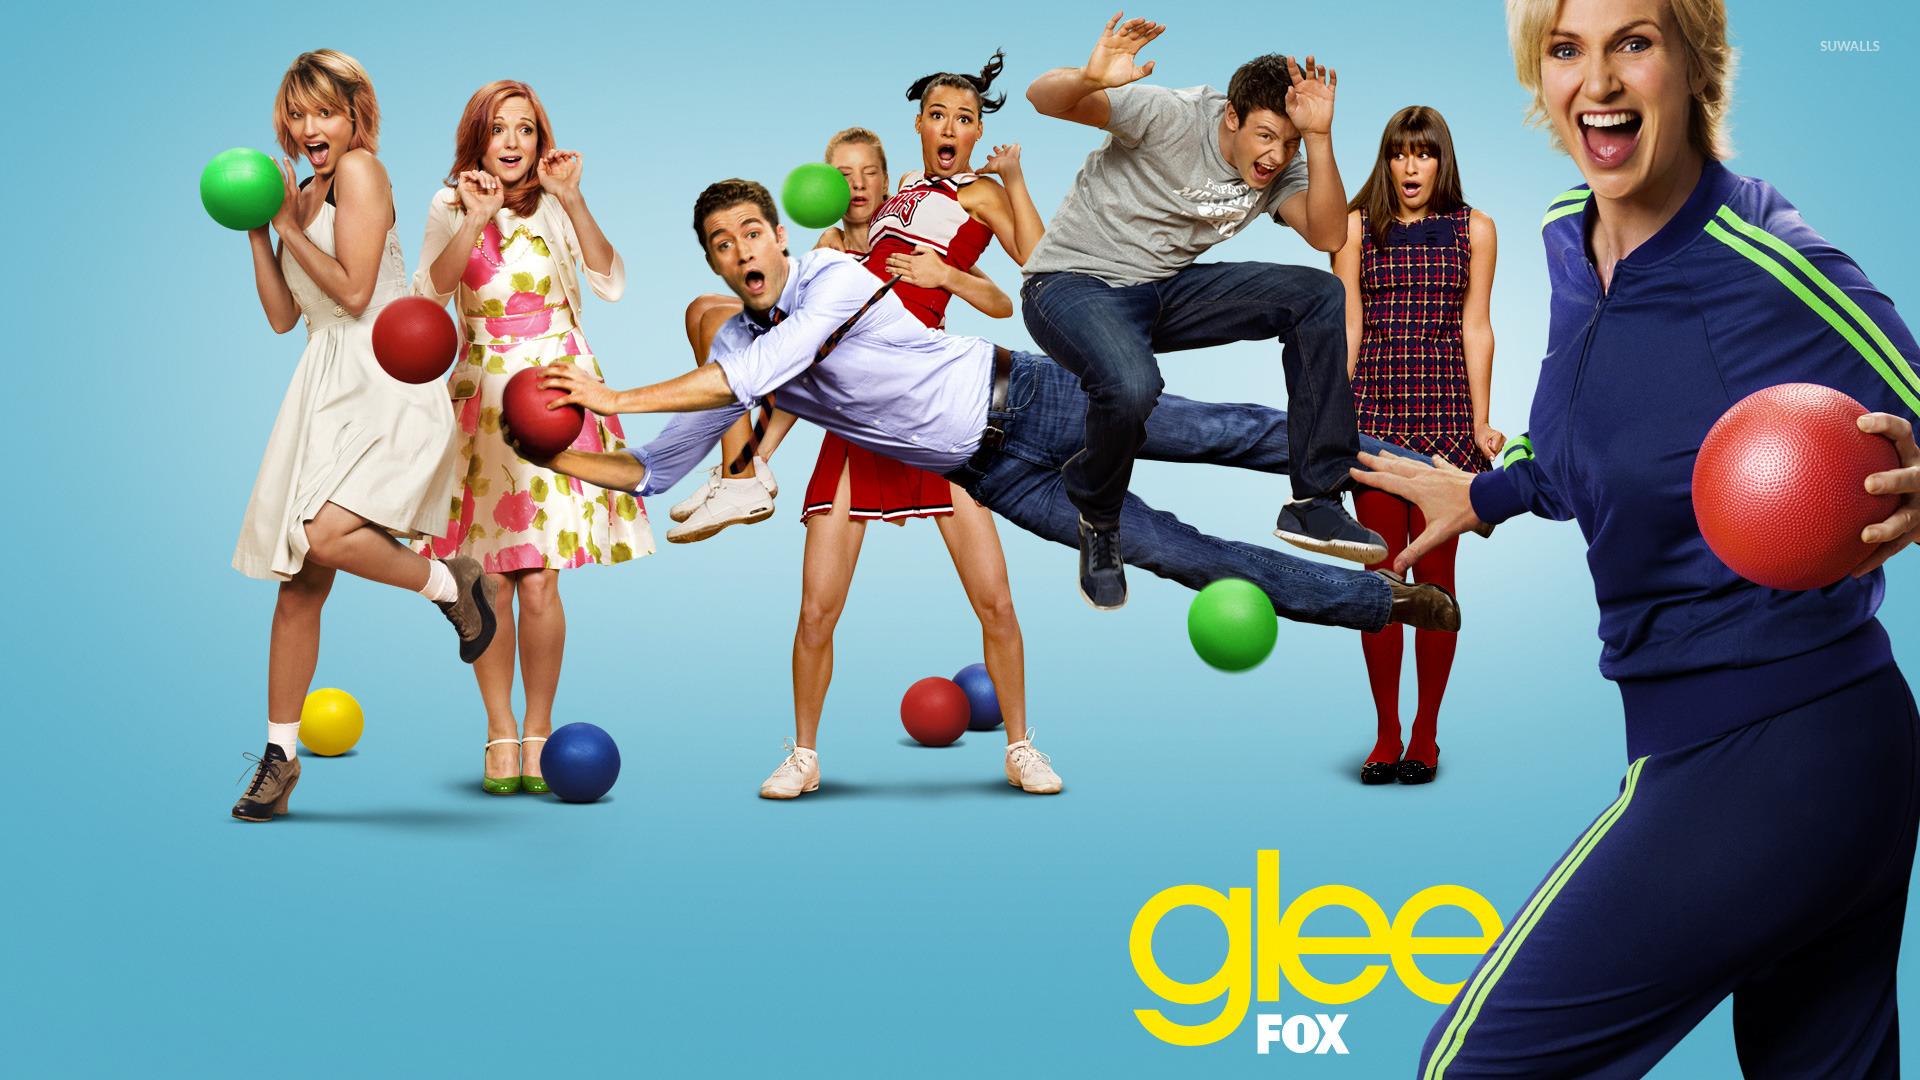 Glee wallpaper   TV Show wallpapers   12542 1920x1080